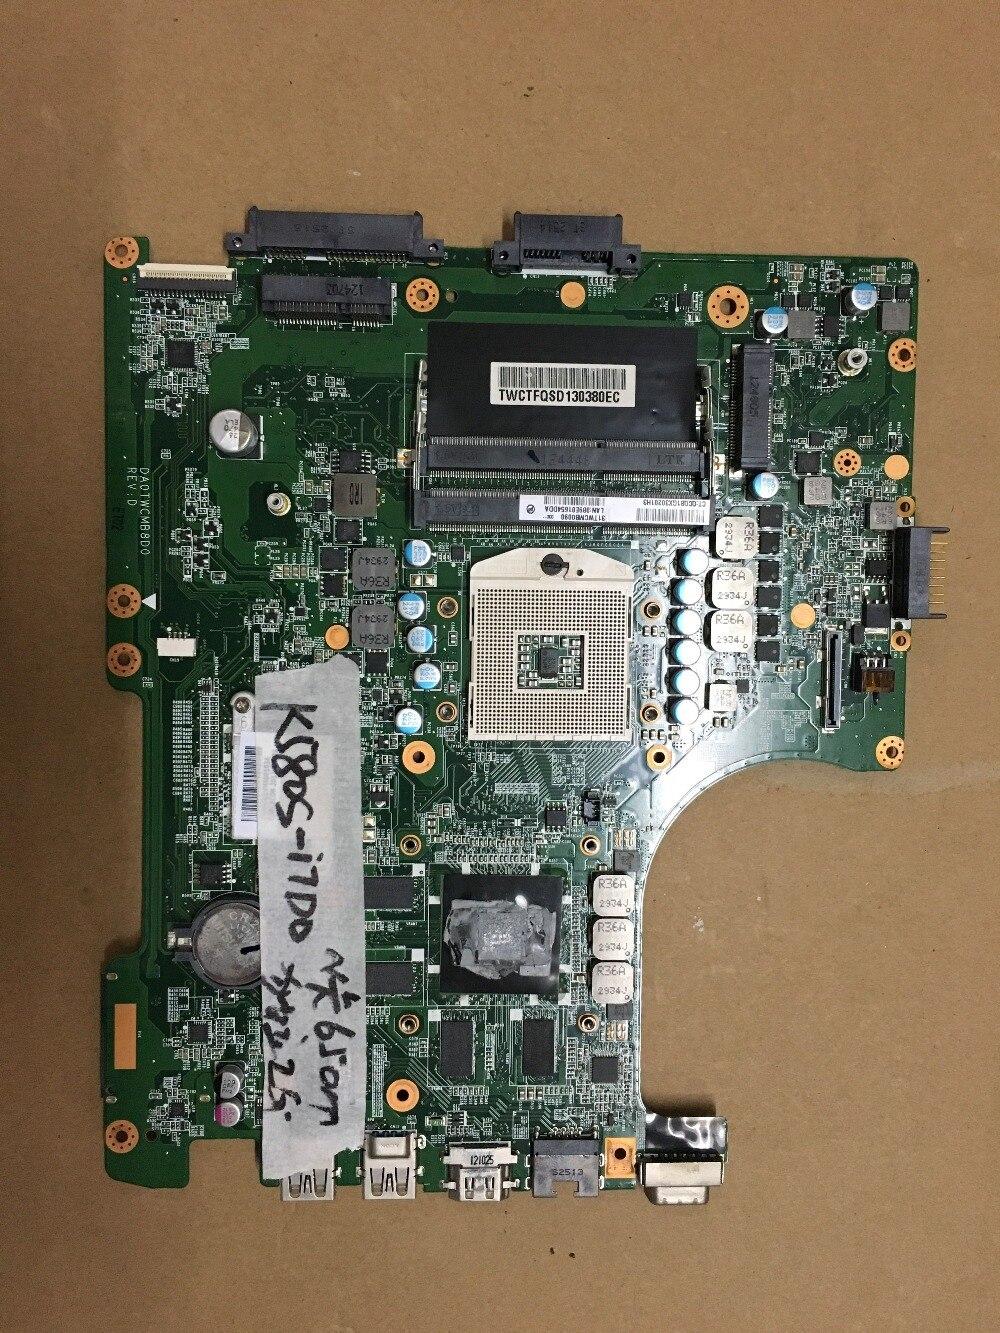 Original I5 I7 placa base para K580S placa base DA0TWCMB8D0 GT640M GT650M totalmente-in Placa base de portátil from Ordenadores y oficina on AliExpress - 11.11_Double 11_Singles' Day 1